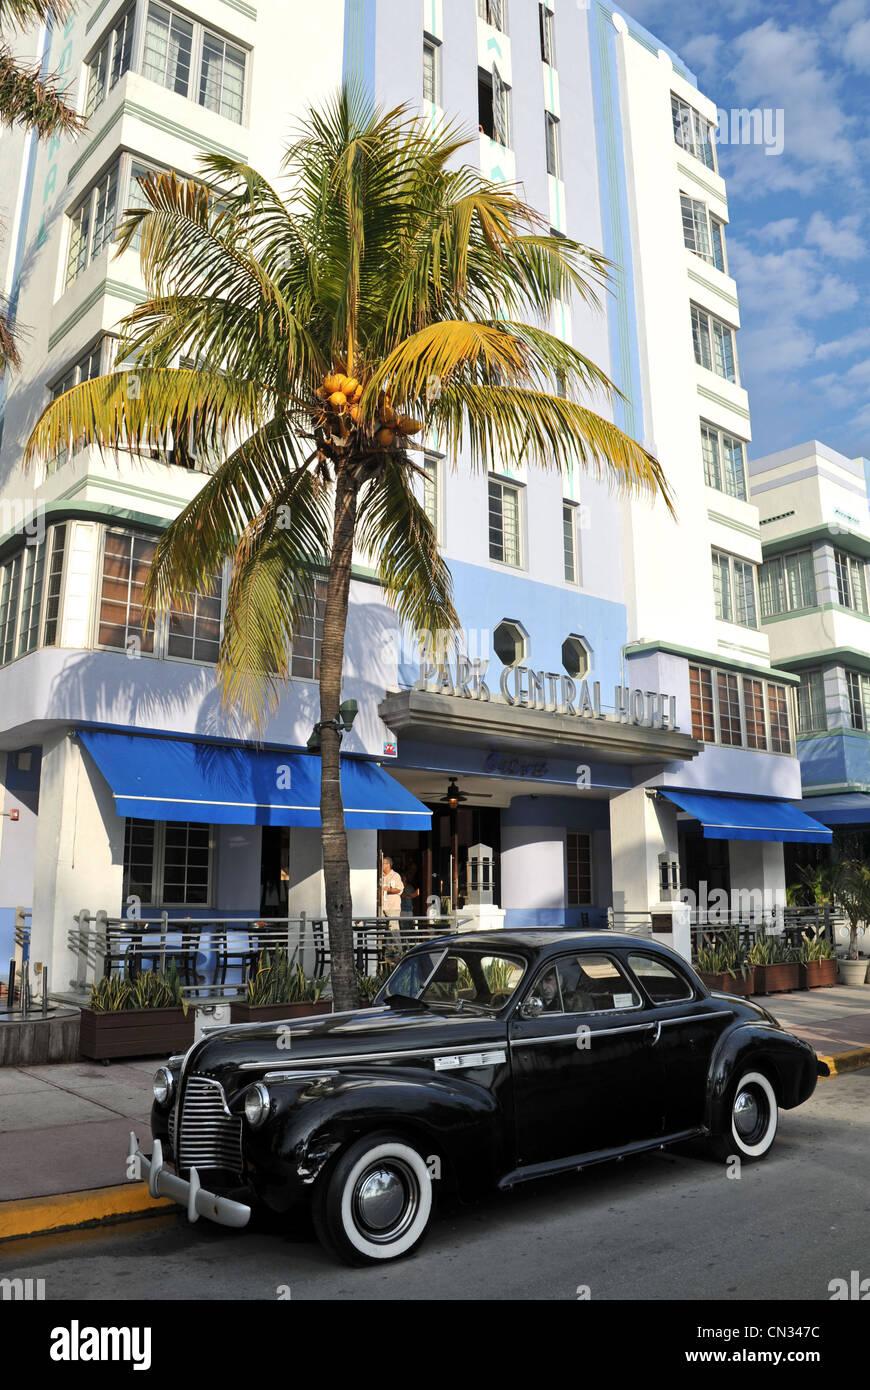 Park Central Hotel, South Beach, Miami, Florida, USA - Stock Image